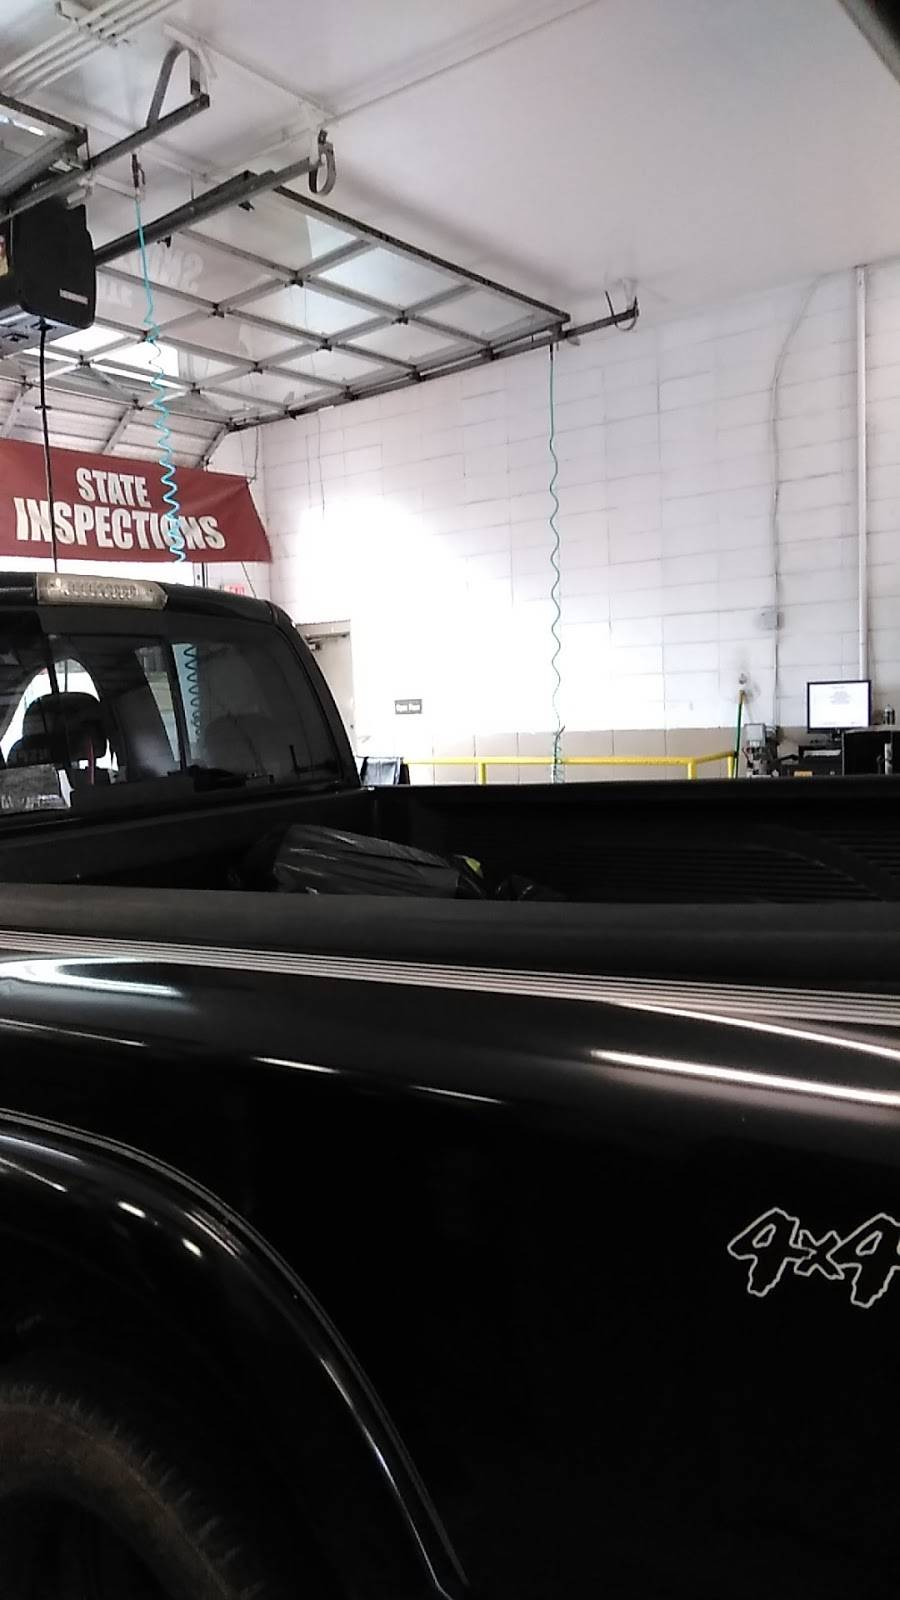 Jiffy Lube - car repair  | Photo 3 of 5 | Address: 5501 University Pkwy, Winston-Salem, NC 27105, USA | Phone: (336) 661-7997